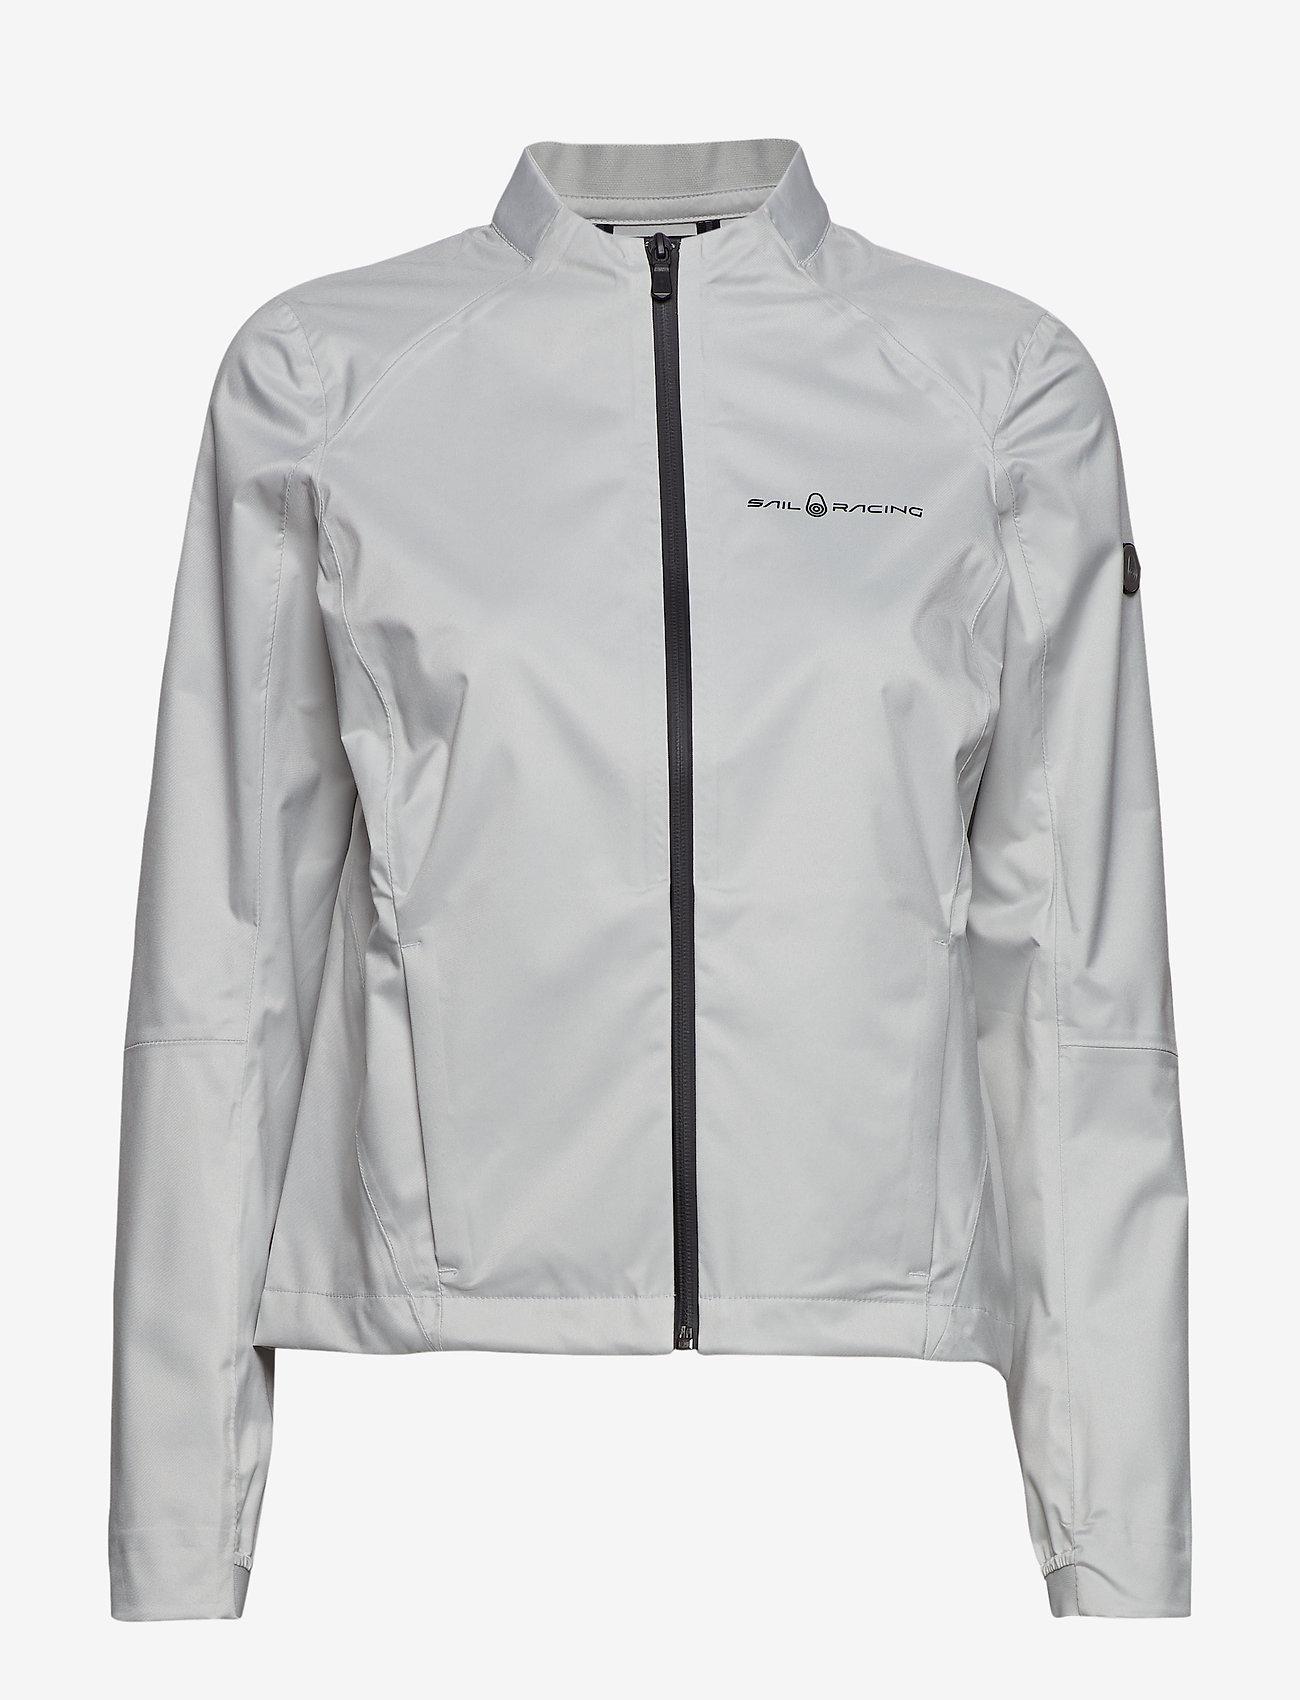 Sail Racing - W GALE TECHNICAL JACKET - outdoor & rain jackets - glacier grey - 0